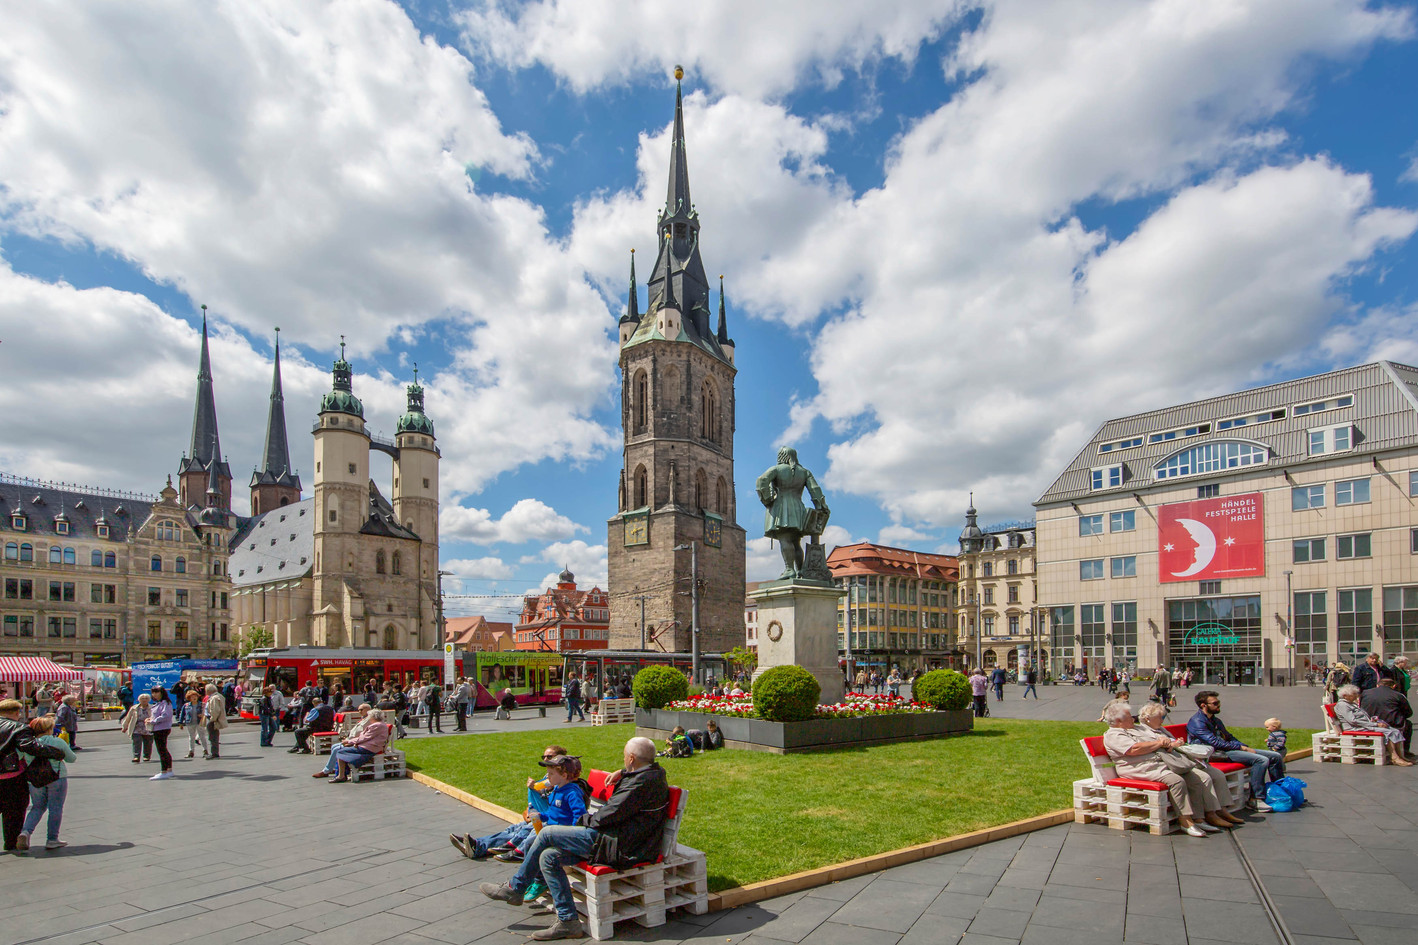 G. F. Handel and the Marktkirche